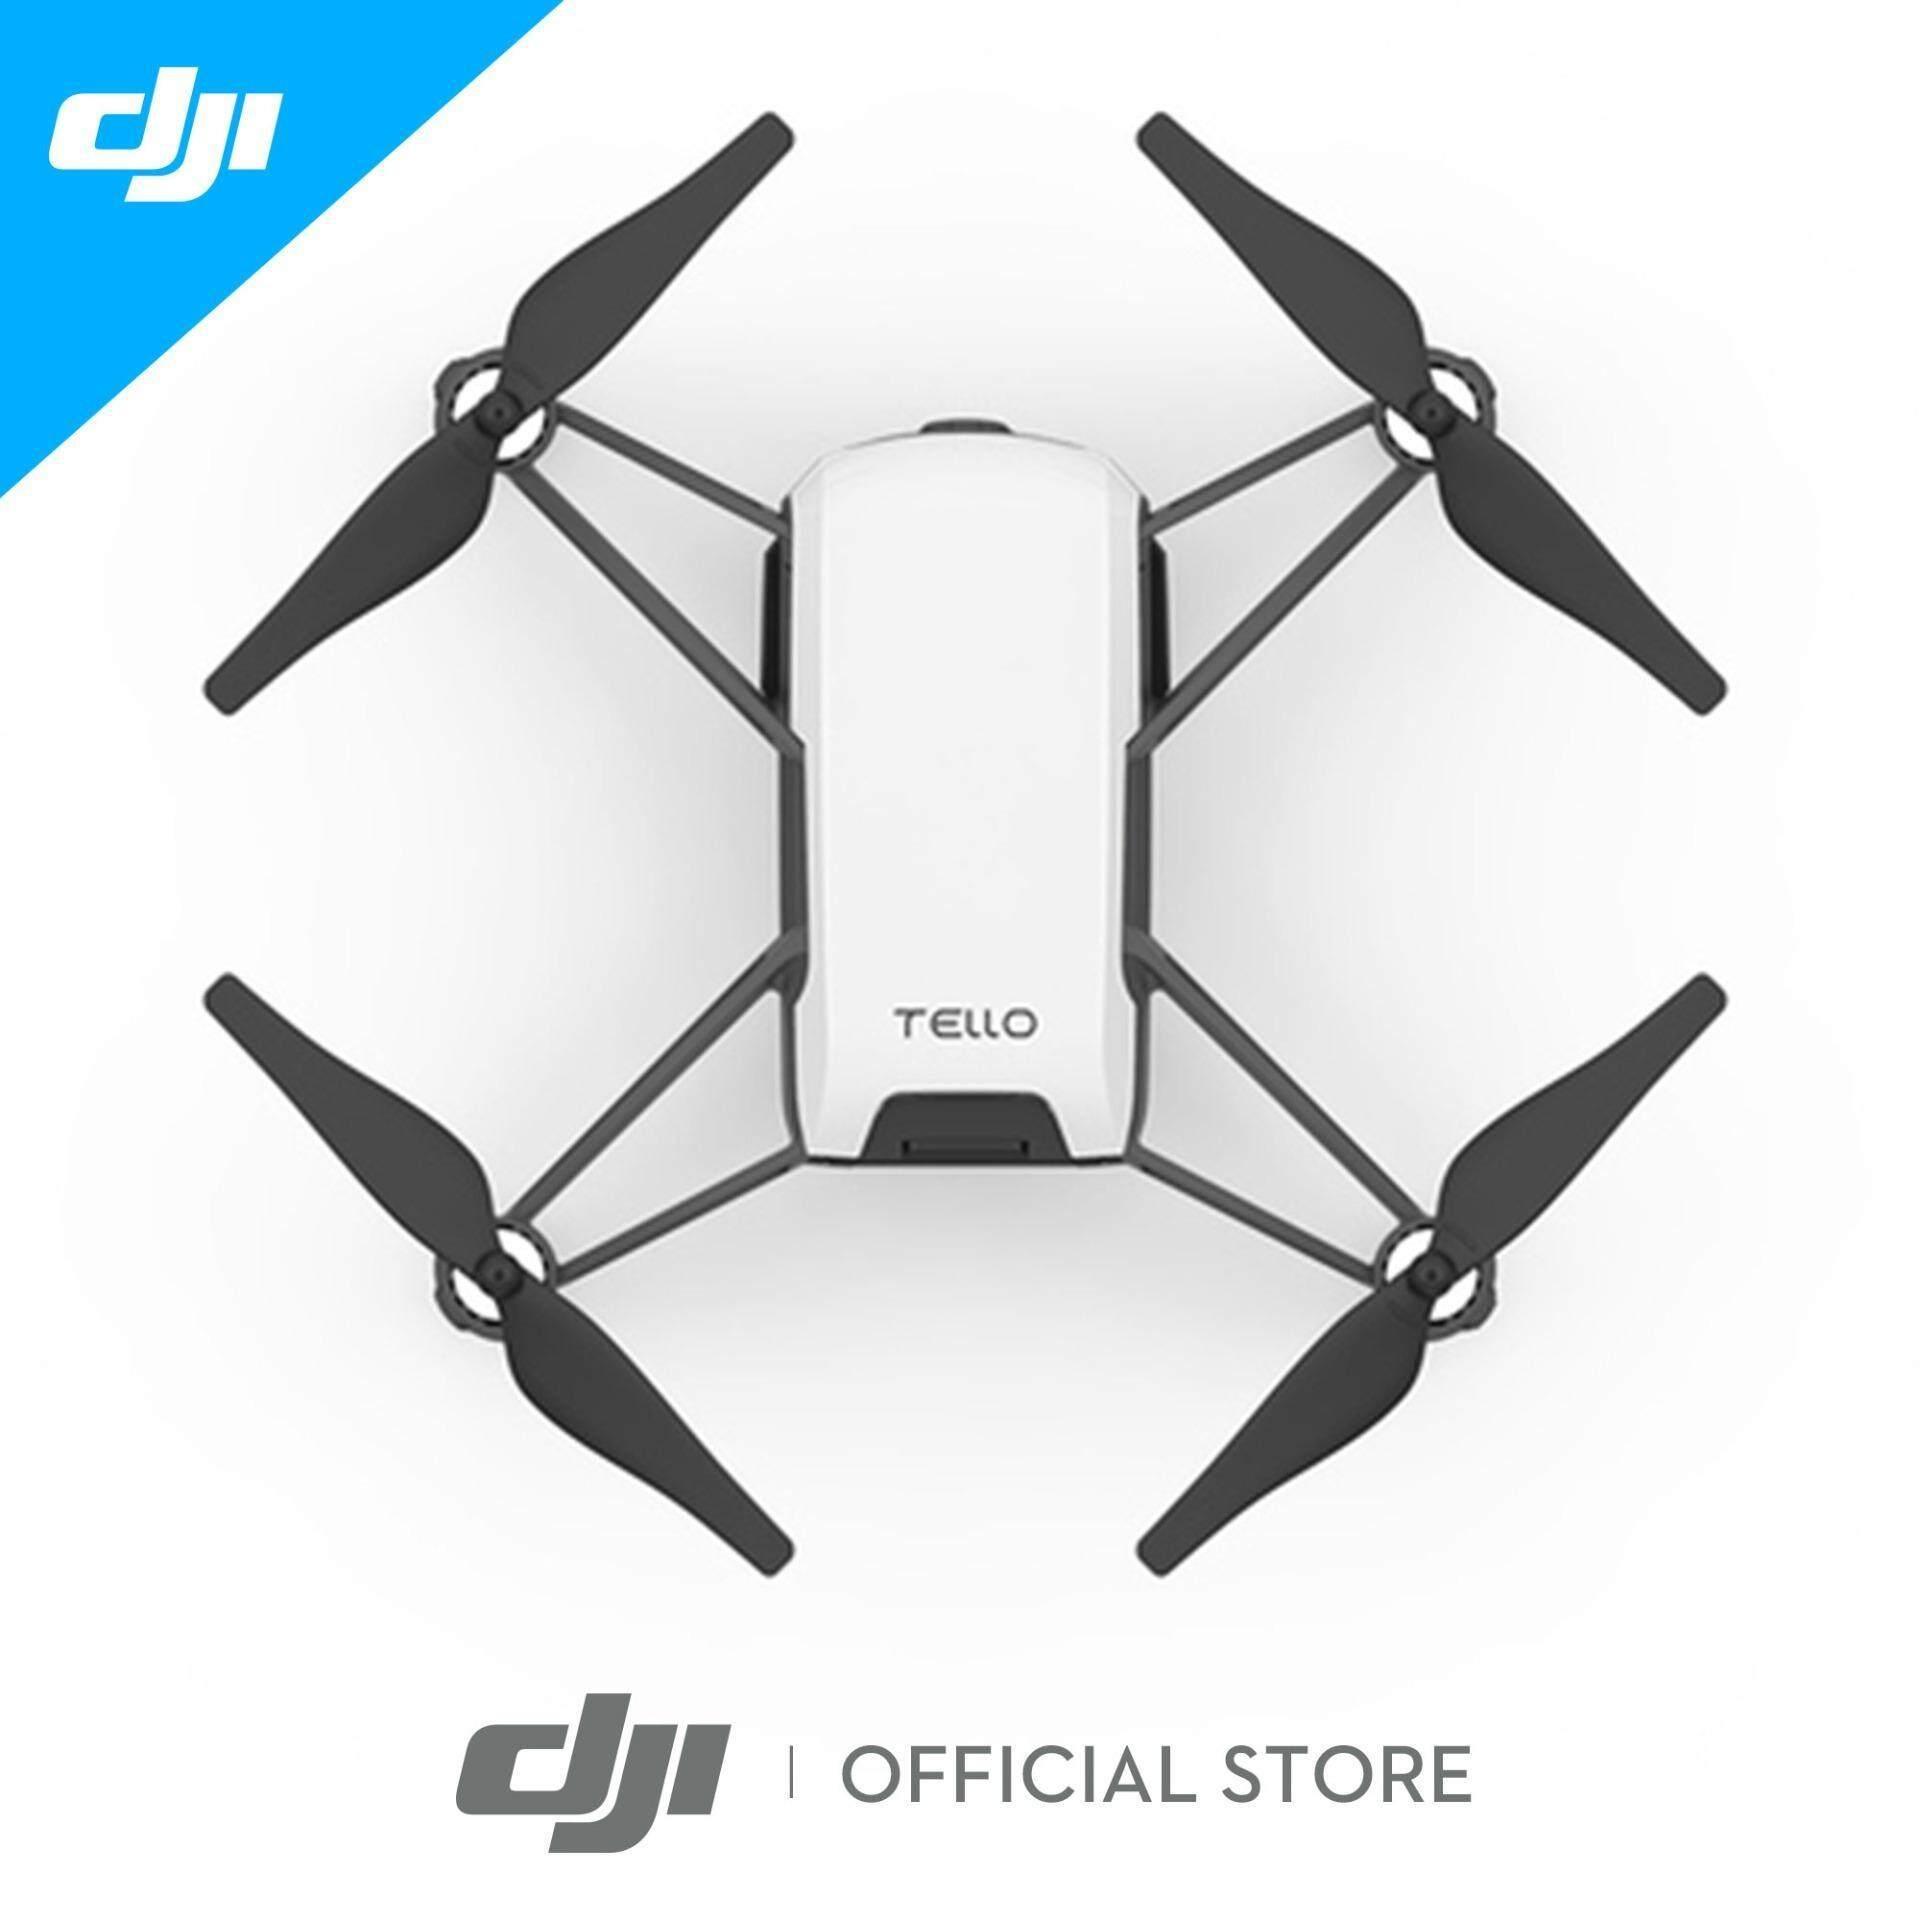 Tello Drone โดรนจิ๋วพร้อมกล้อง(รับประกัน Phantom Thailand) ( โดรนติดกล้อง ).